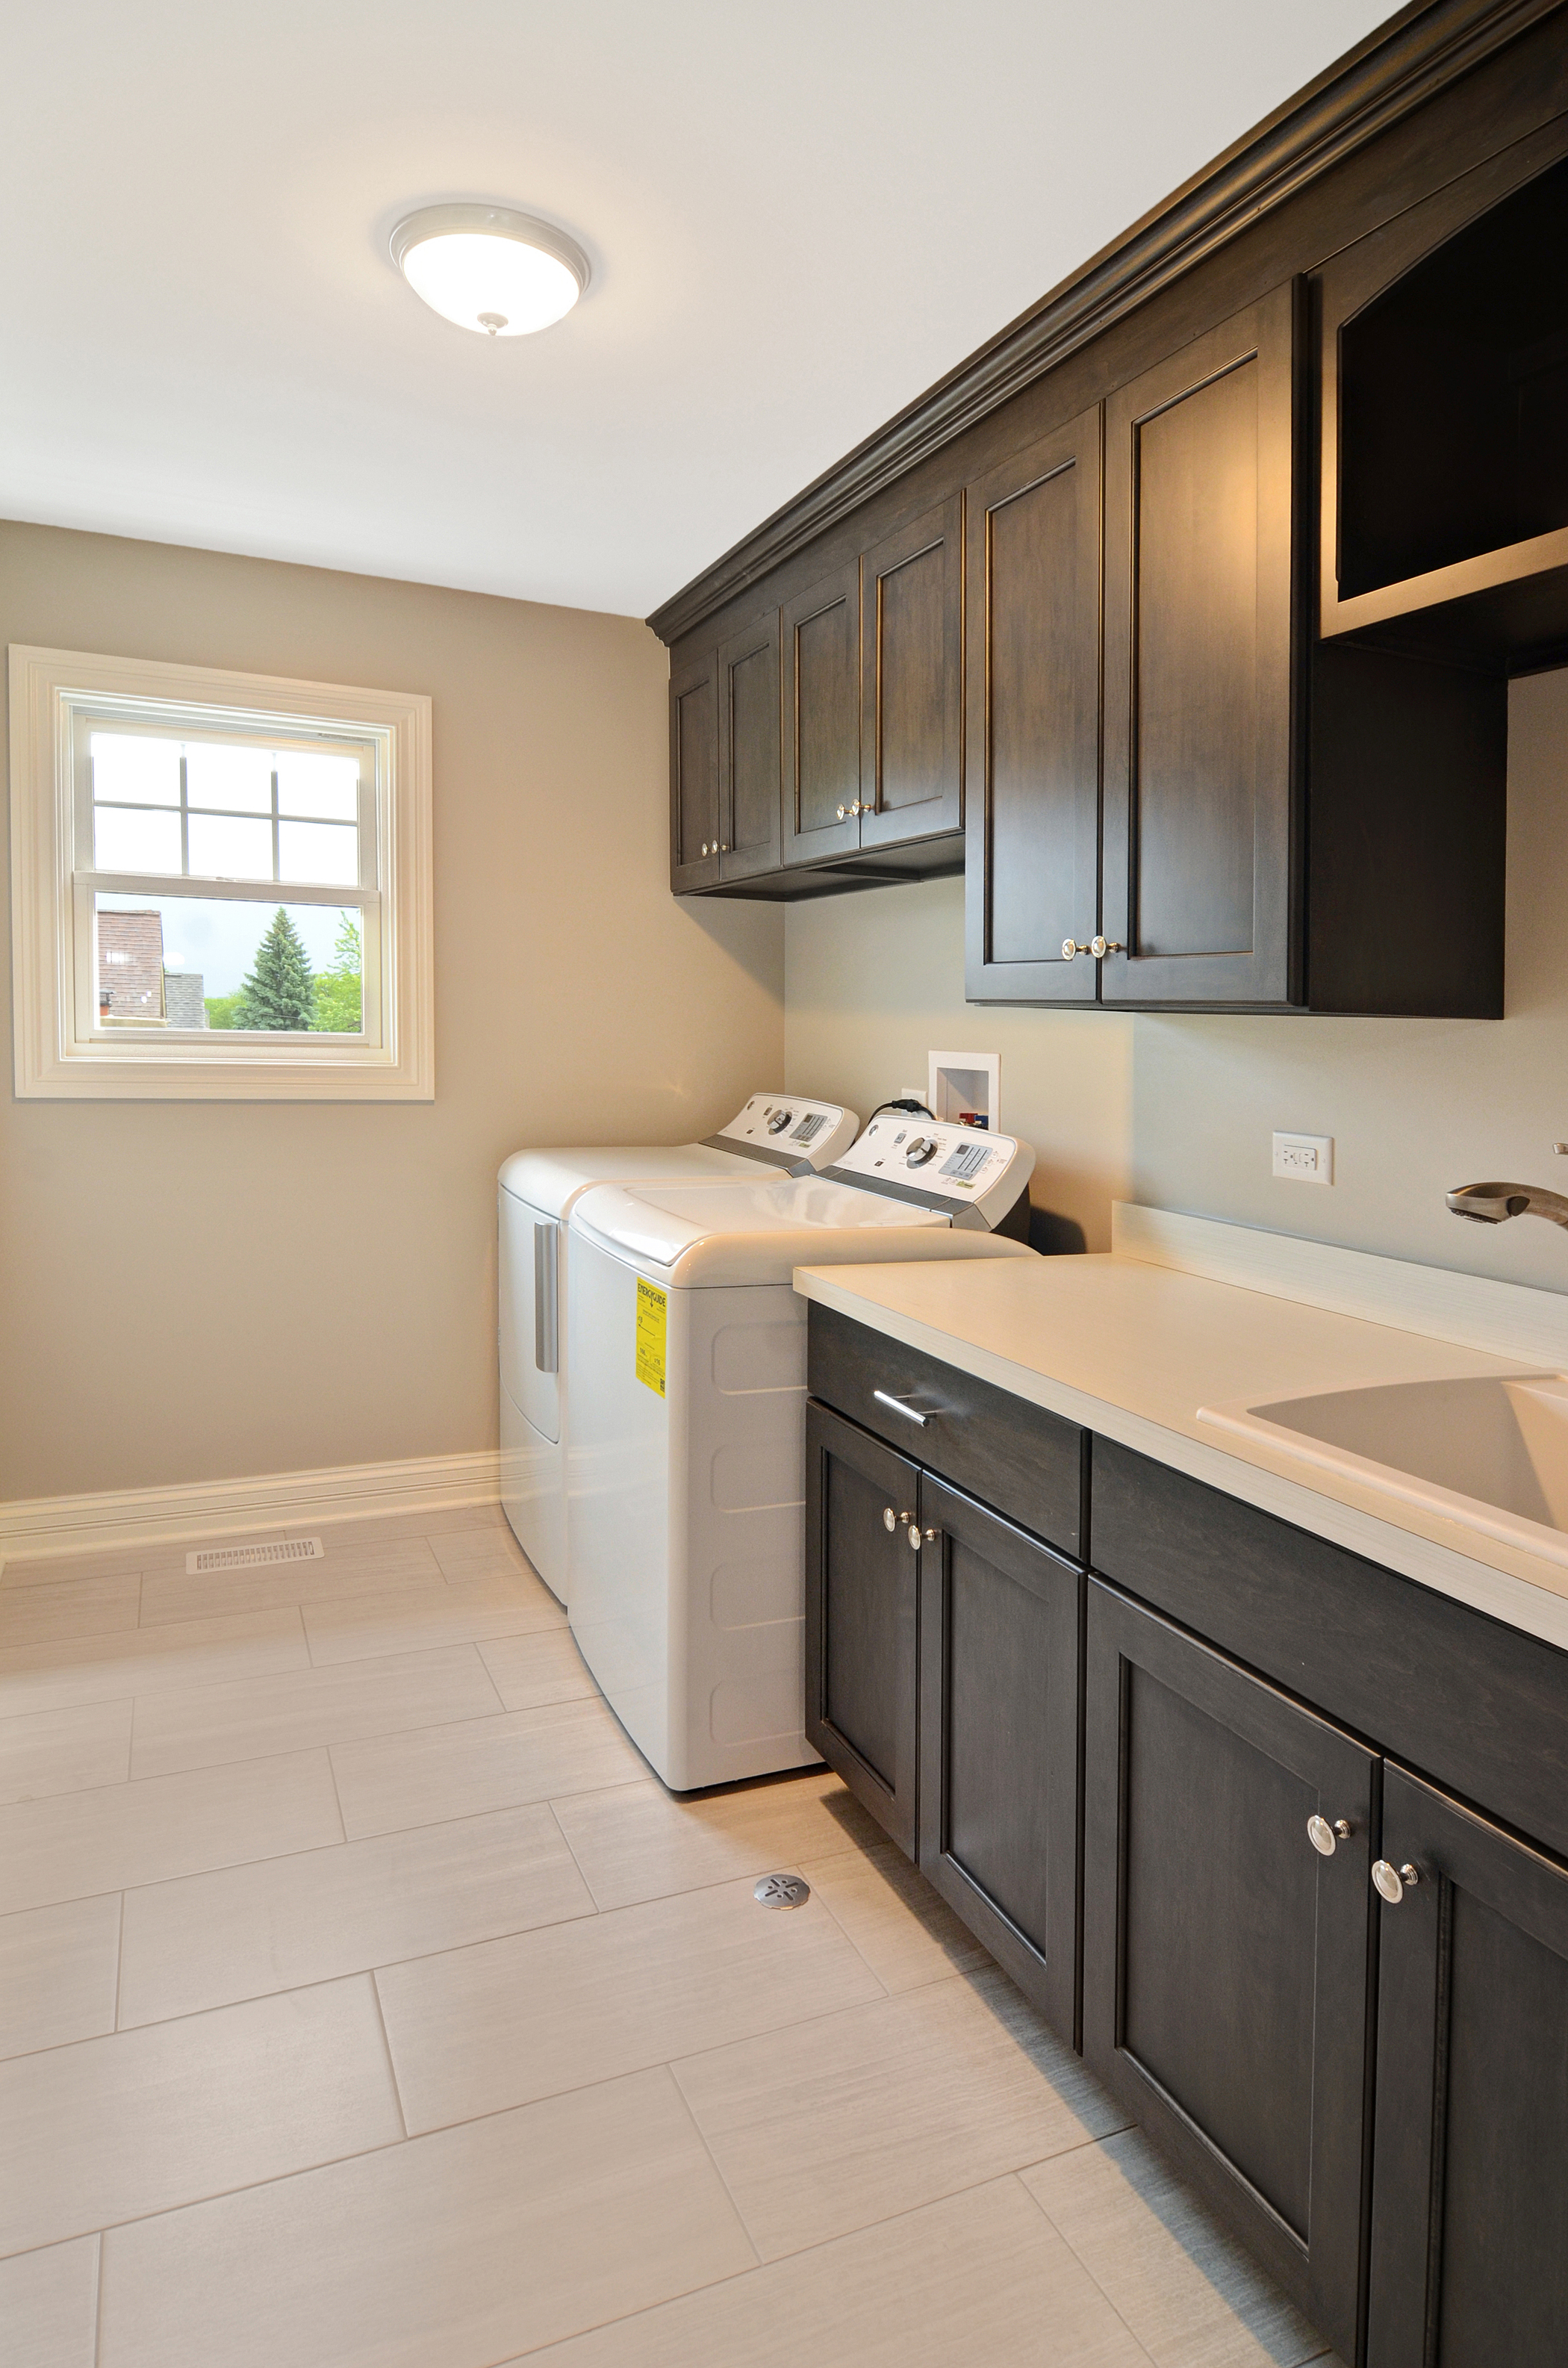 Rite-Way Laundry Room